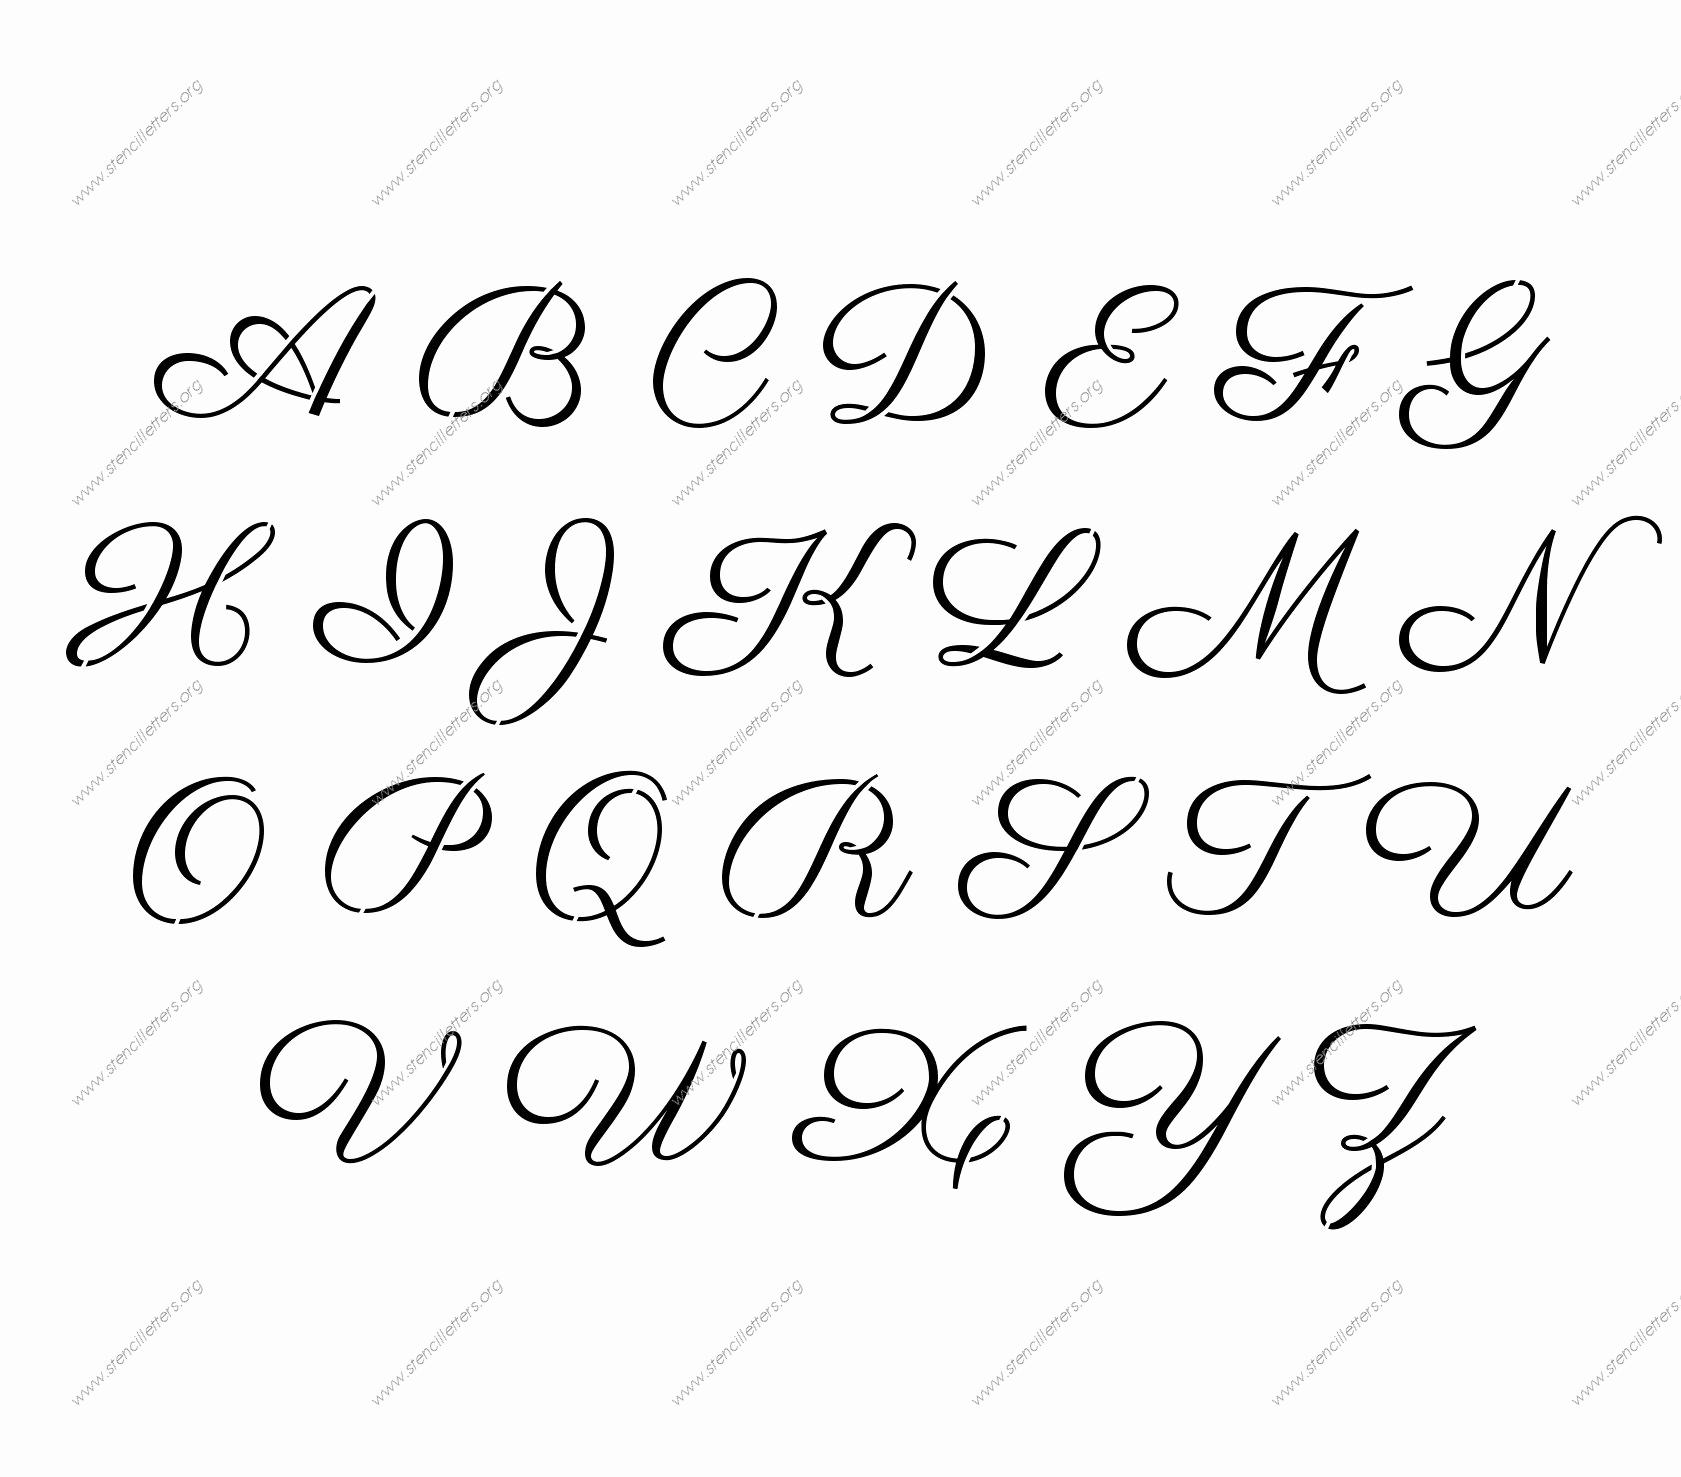 Lettering Stencils to Print Luxury Stencil Letters Free Printable Stencil Letters Fonts